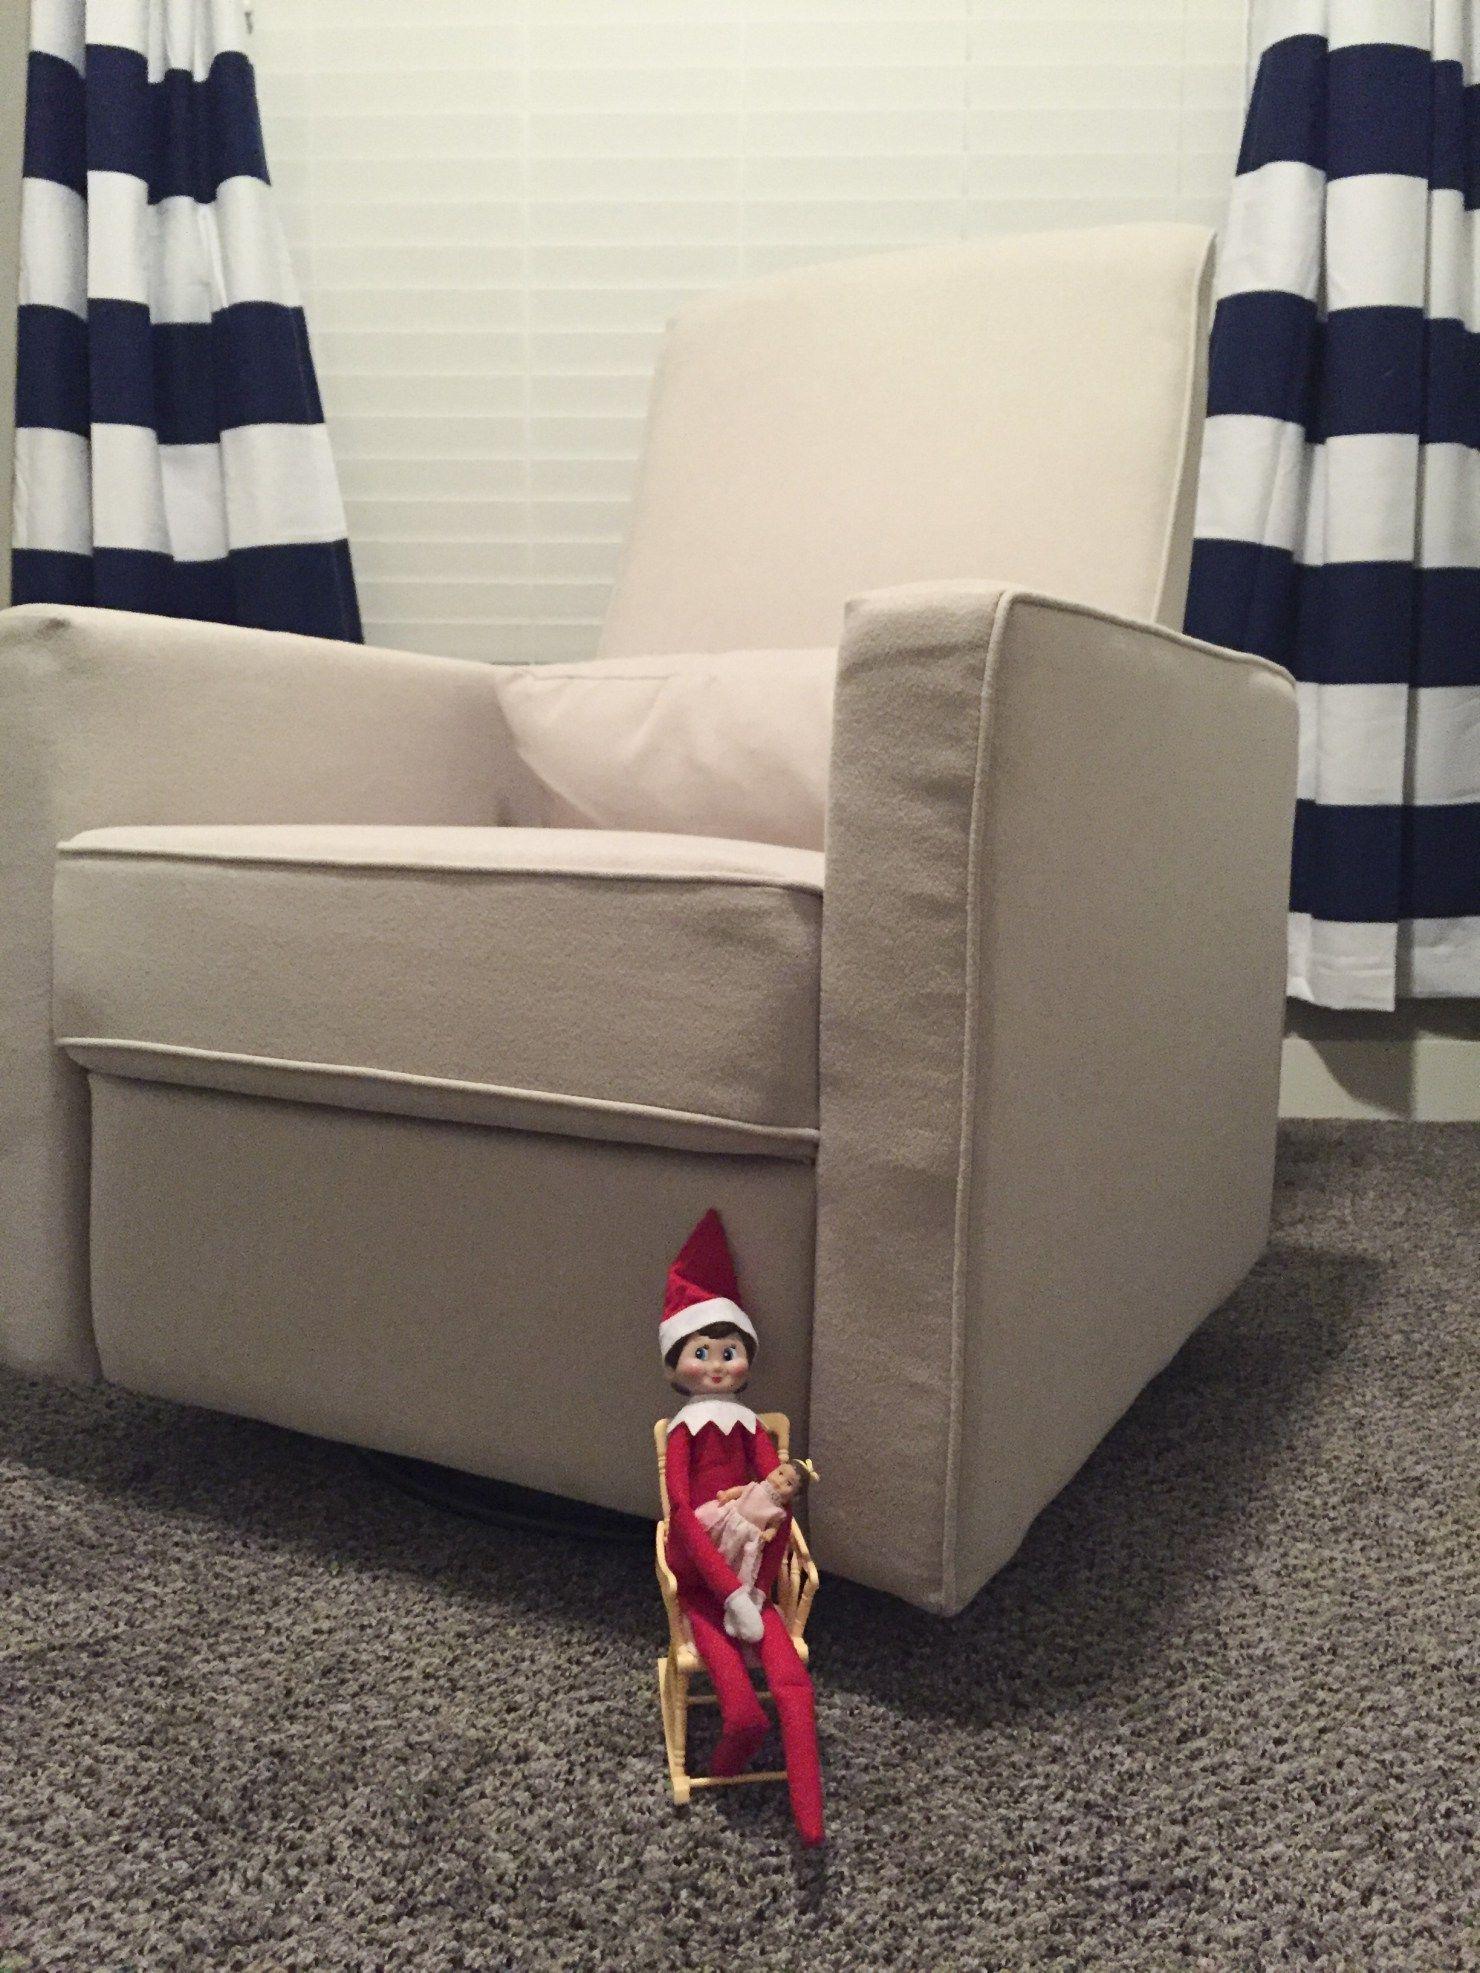 Elf on the Shelf - Arrival Letter Free Download - Smudgey #elfontheshelfarrival Elf on the Shelf - Arrival Letter Free Download - Smudgey #elfontheshelfarrivalletter